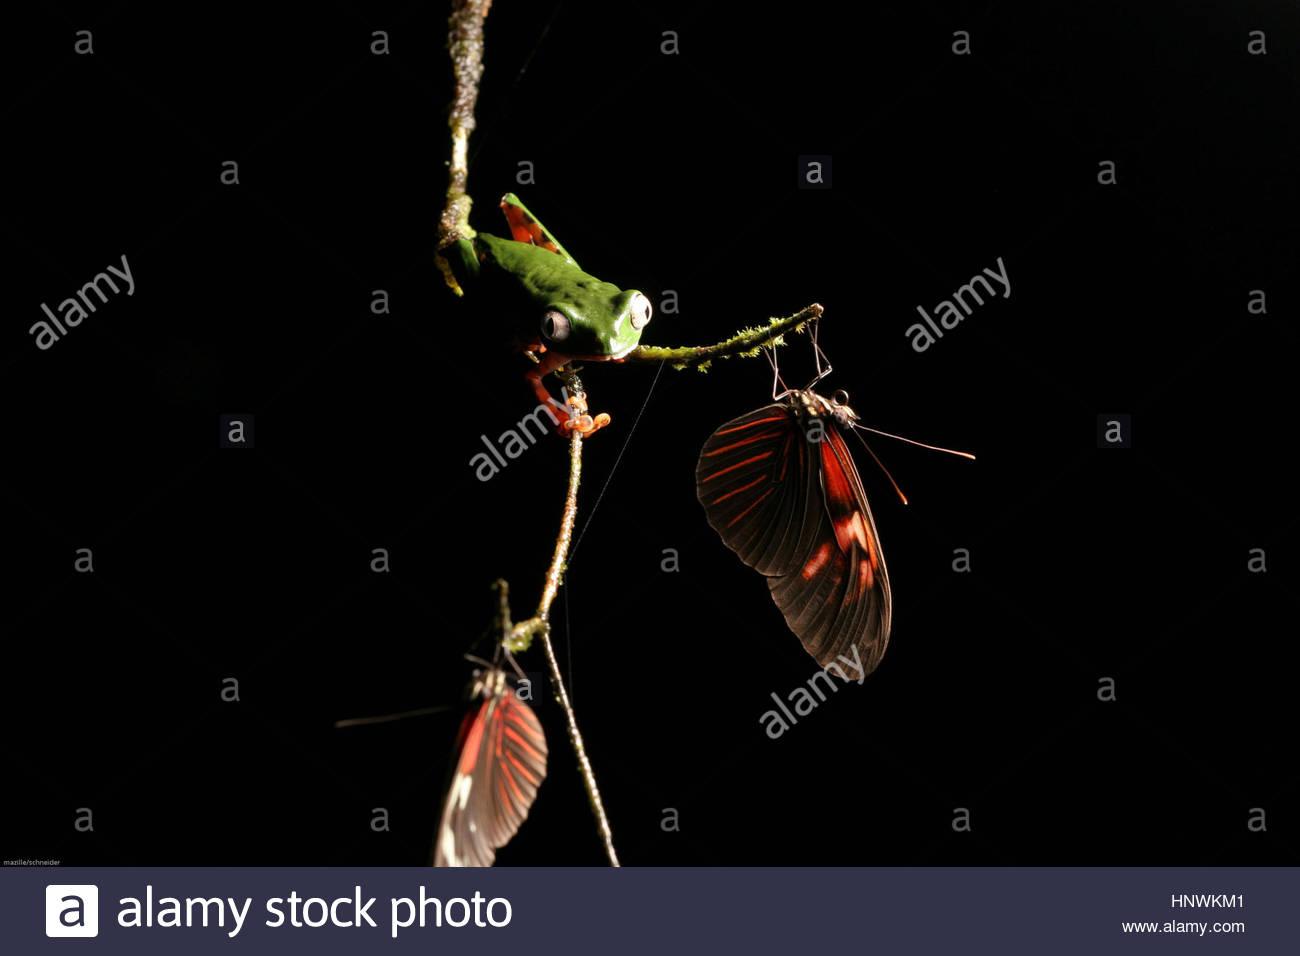 A phylomedusa tomoperna frog with a butterfly on a branch, Guyana. - Stock Image